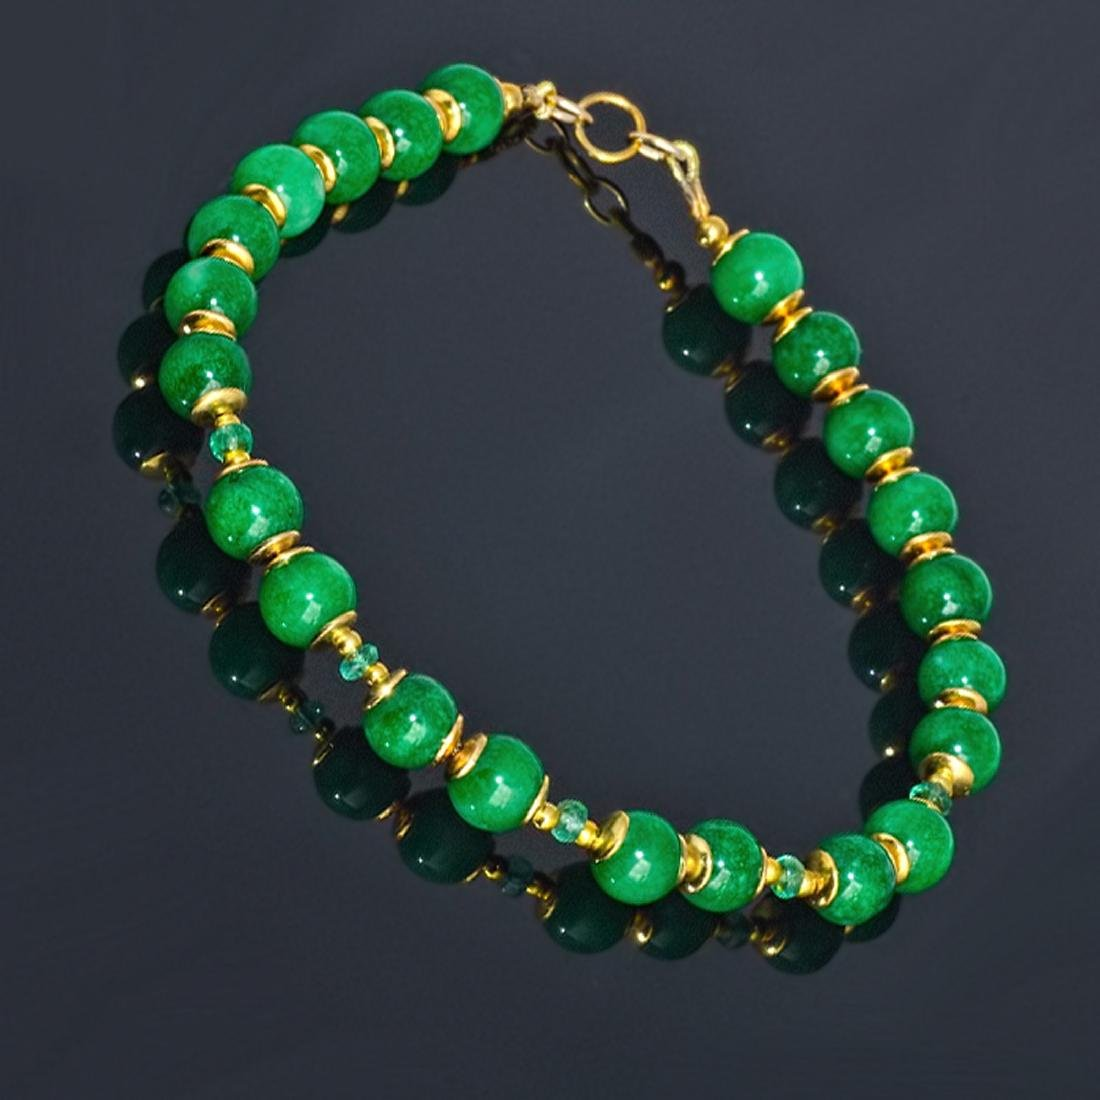 14K Gold Imperial Emerald Green Jade Bracelet - 5